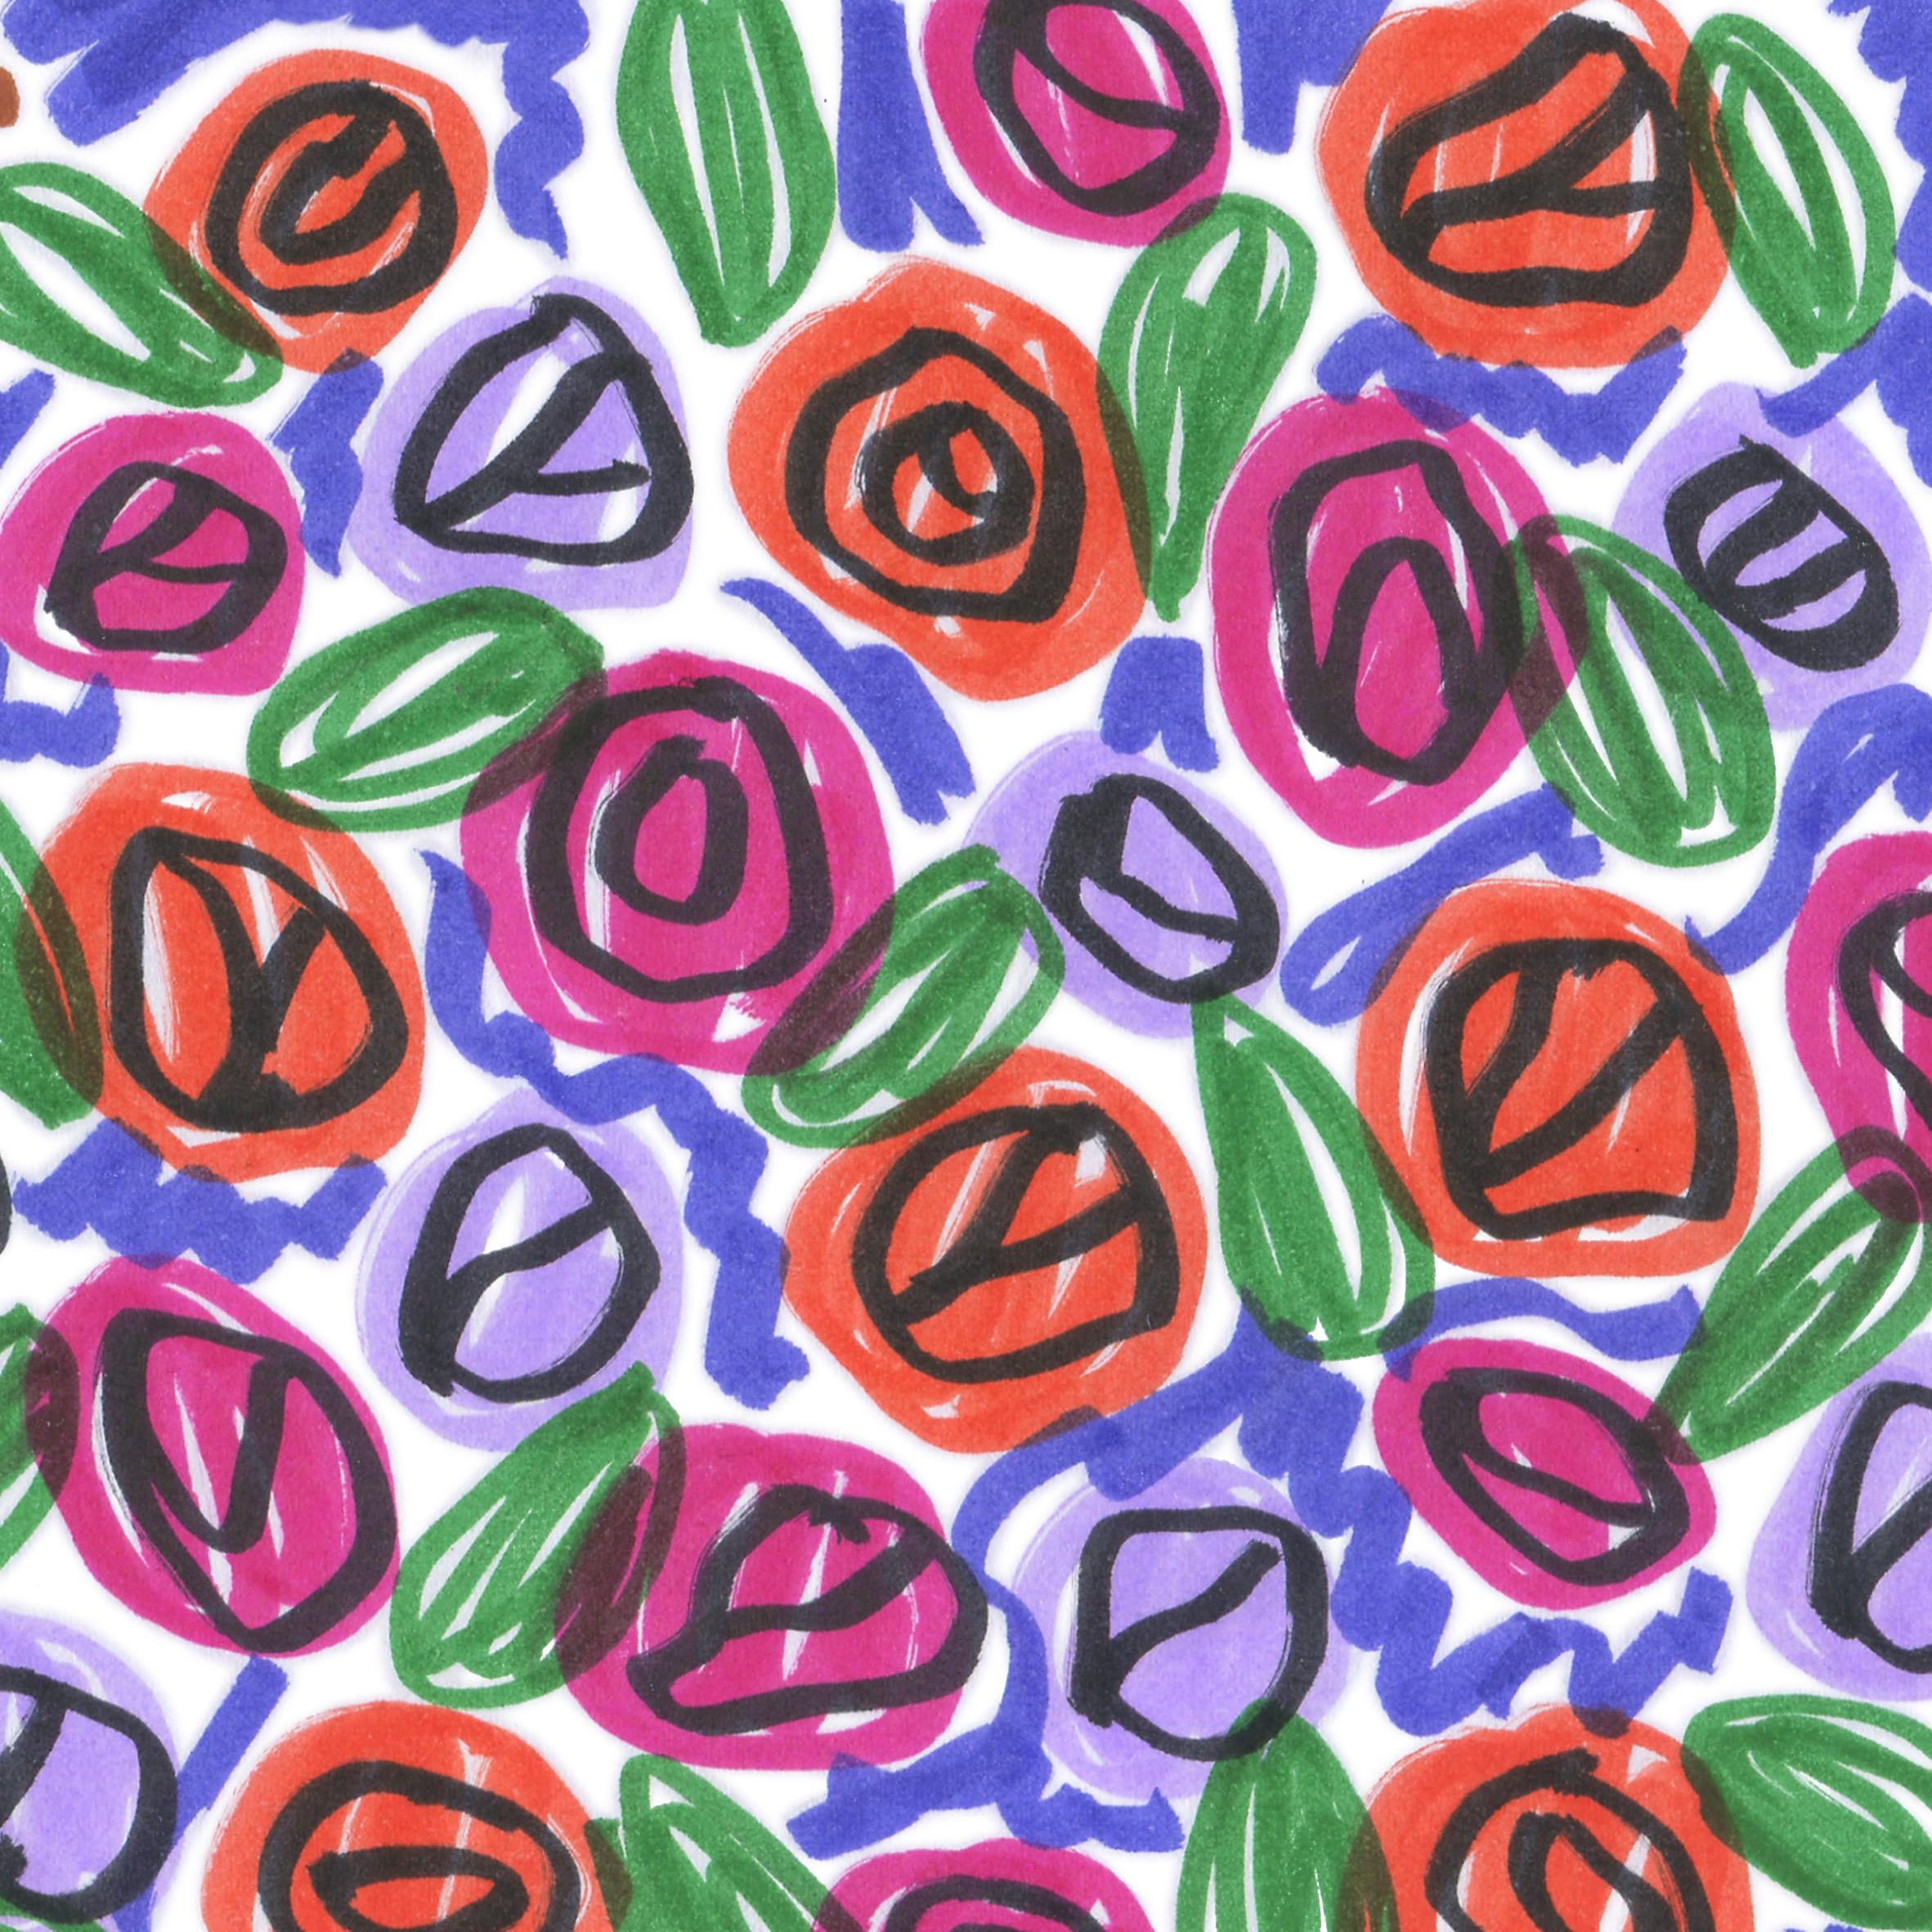 motif végétal 7